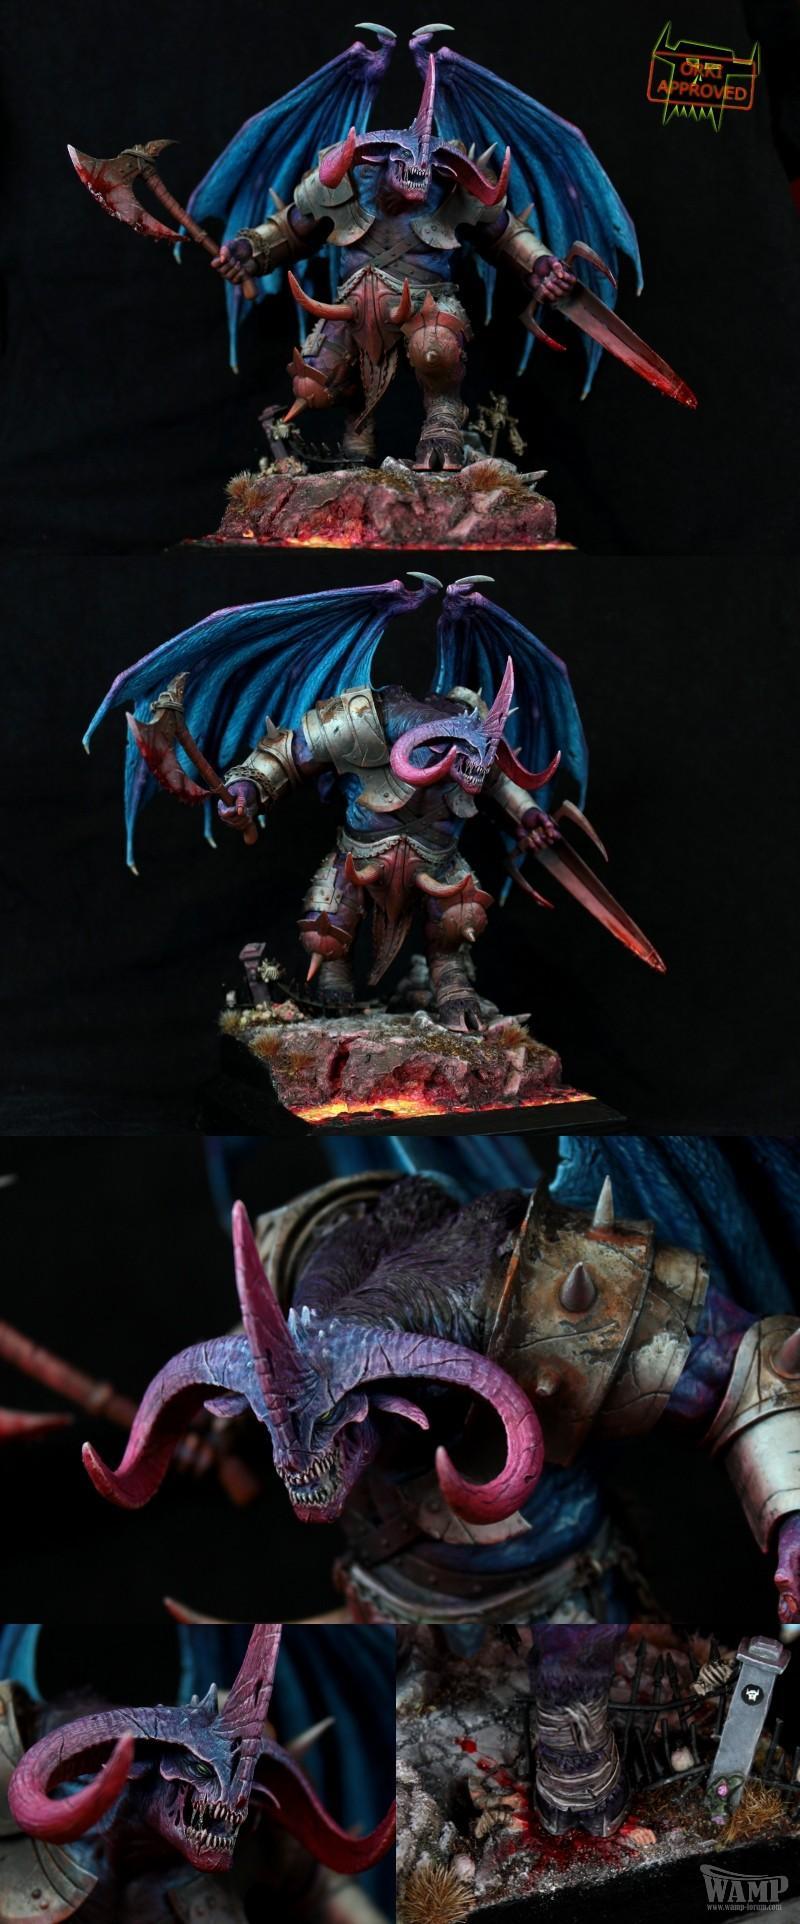 Banebeast, Blood, Chaos, Conversion, Daemon Prince, Daemons, Krull, Non-Metallic Metal, Object Source Lighting, Orki, Splat, Weathered